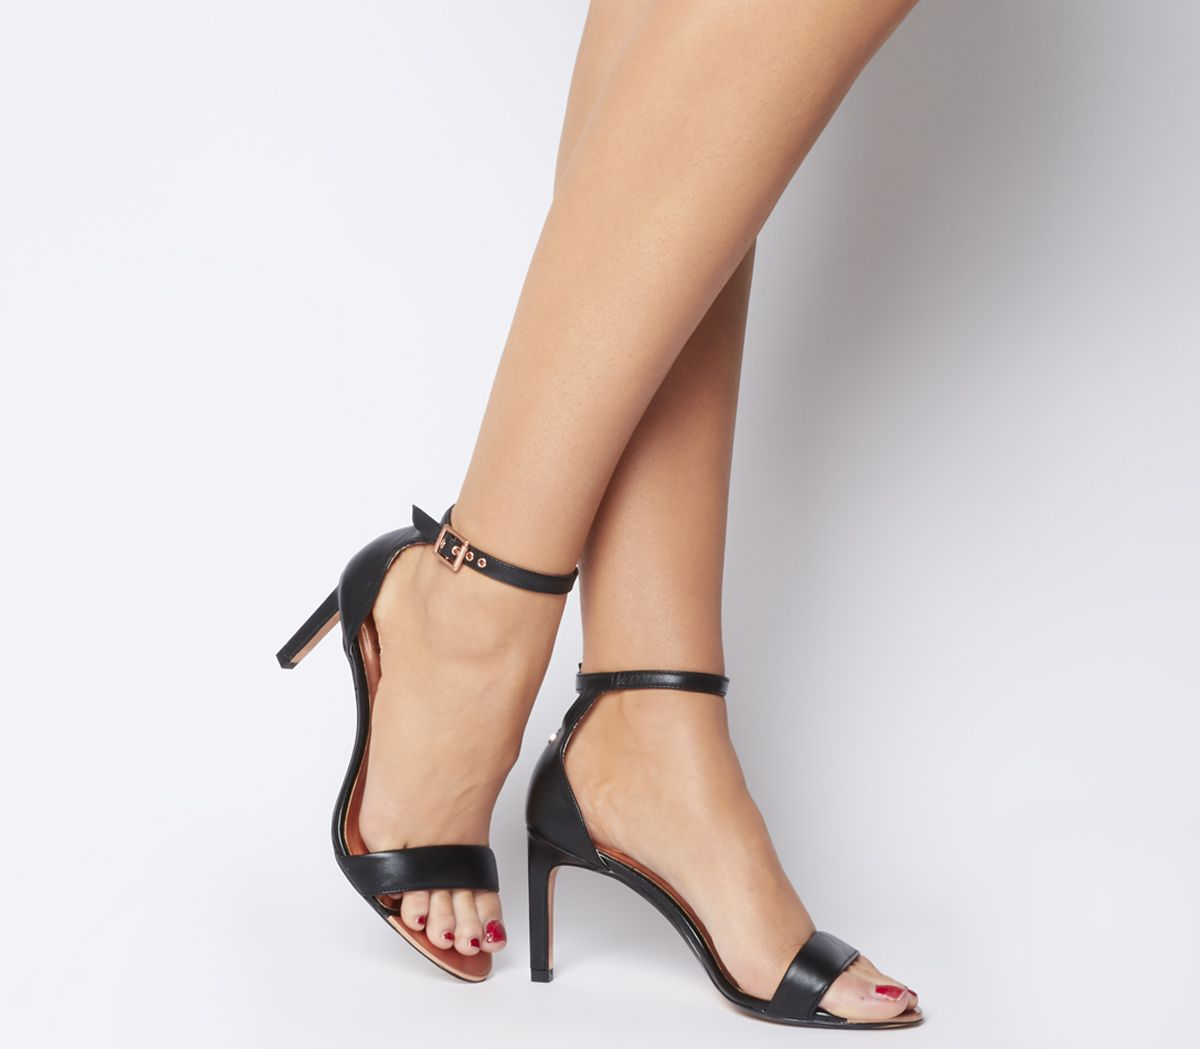 e9d379cd1 Ted Baker Ulanii Heels Black Leather - High Heels